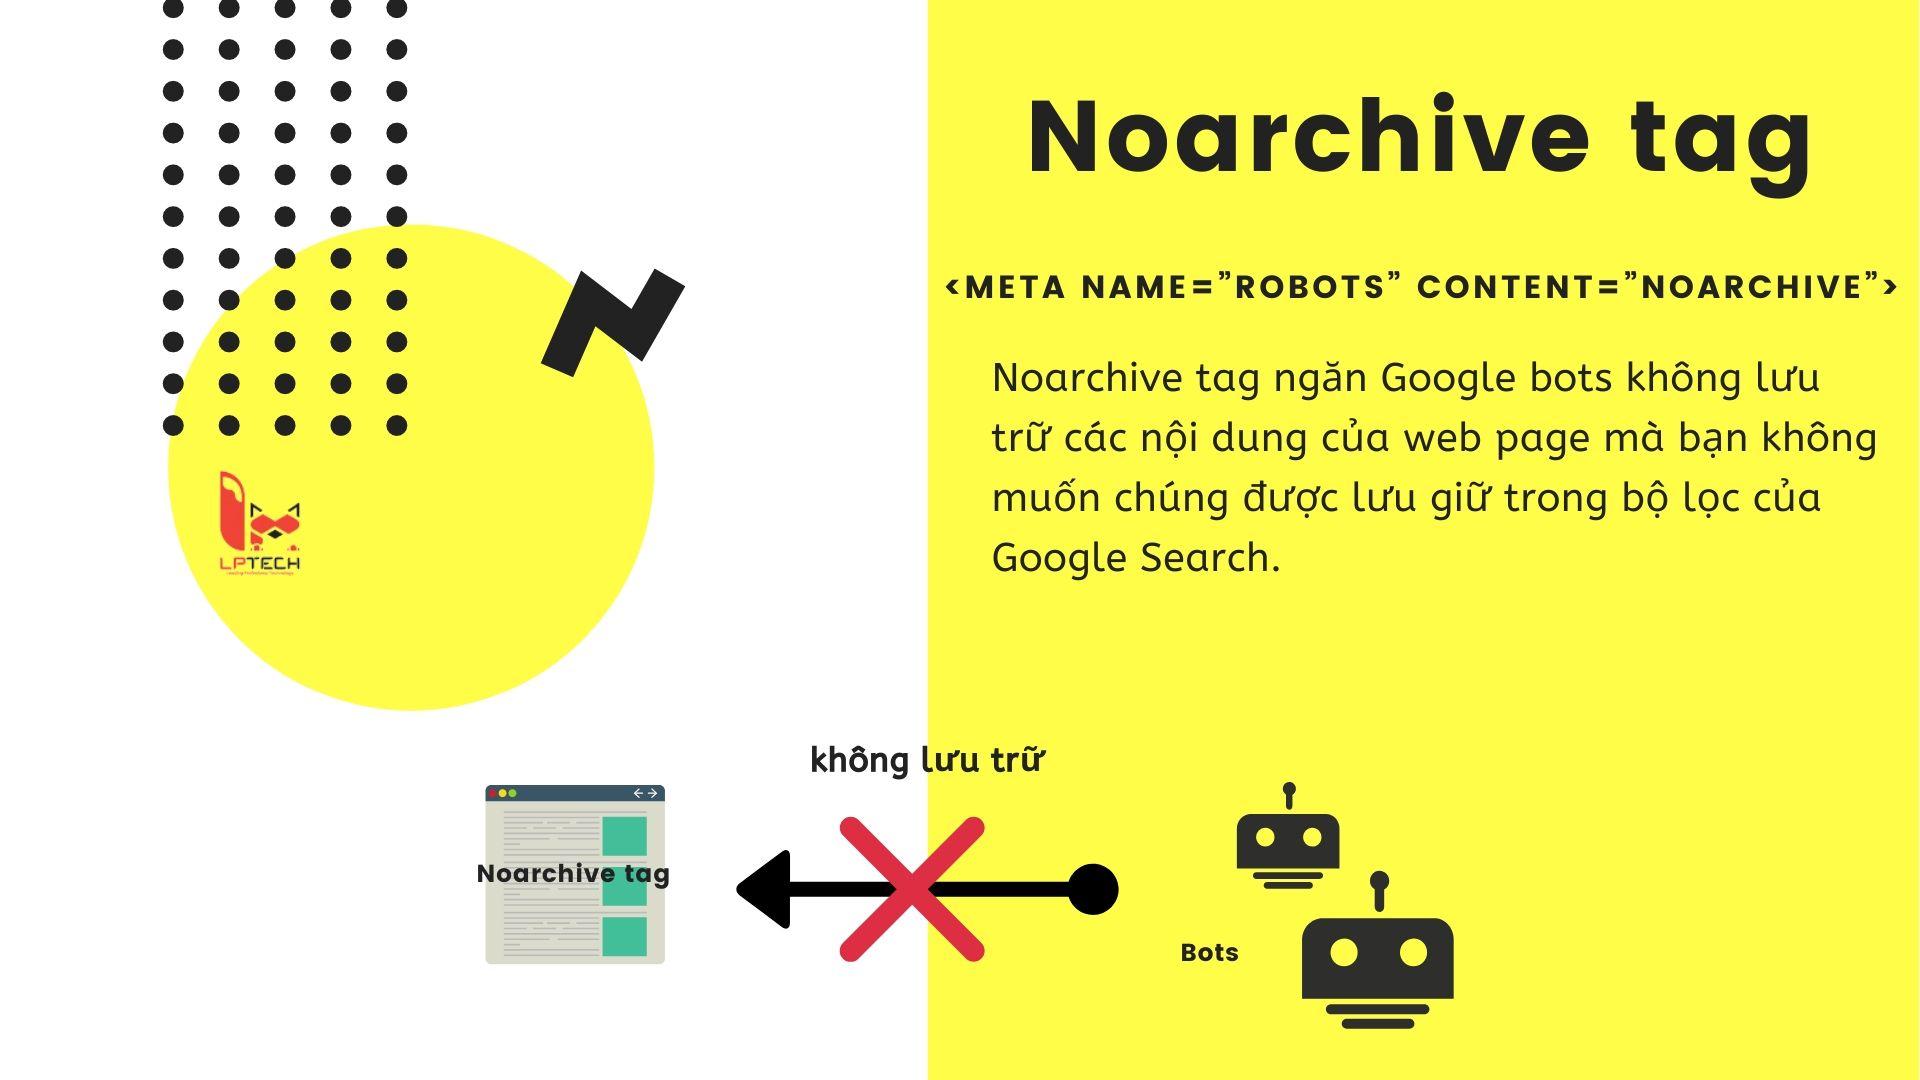 Cách sử dụng noarchive tag